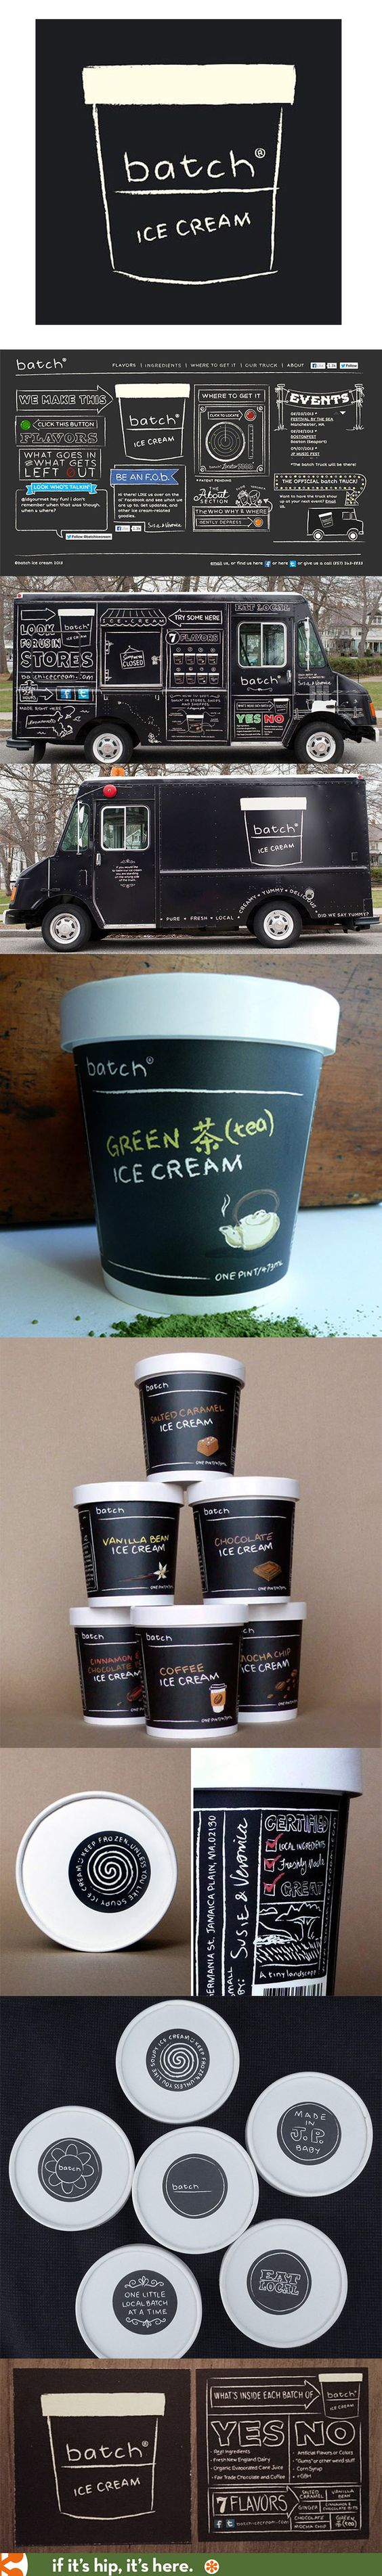 ICECREAMTRUCK - Branding, mobile truck, packaging and web design for Batch Ice Cream.